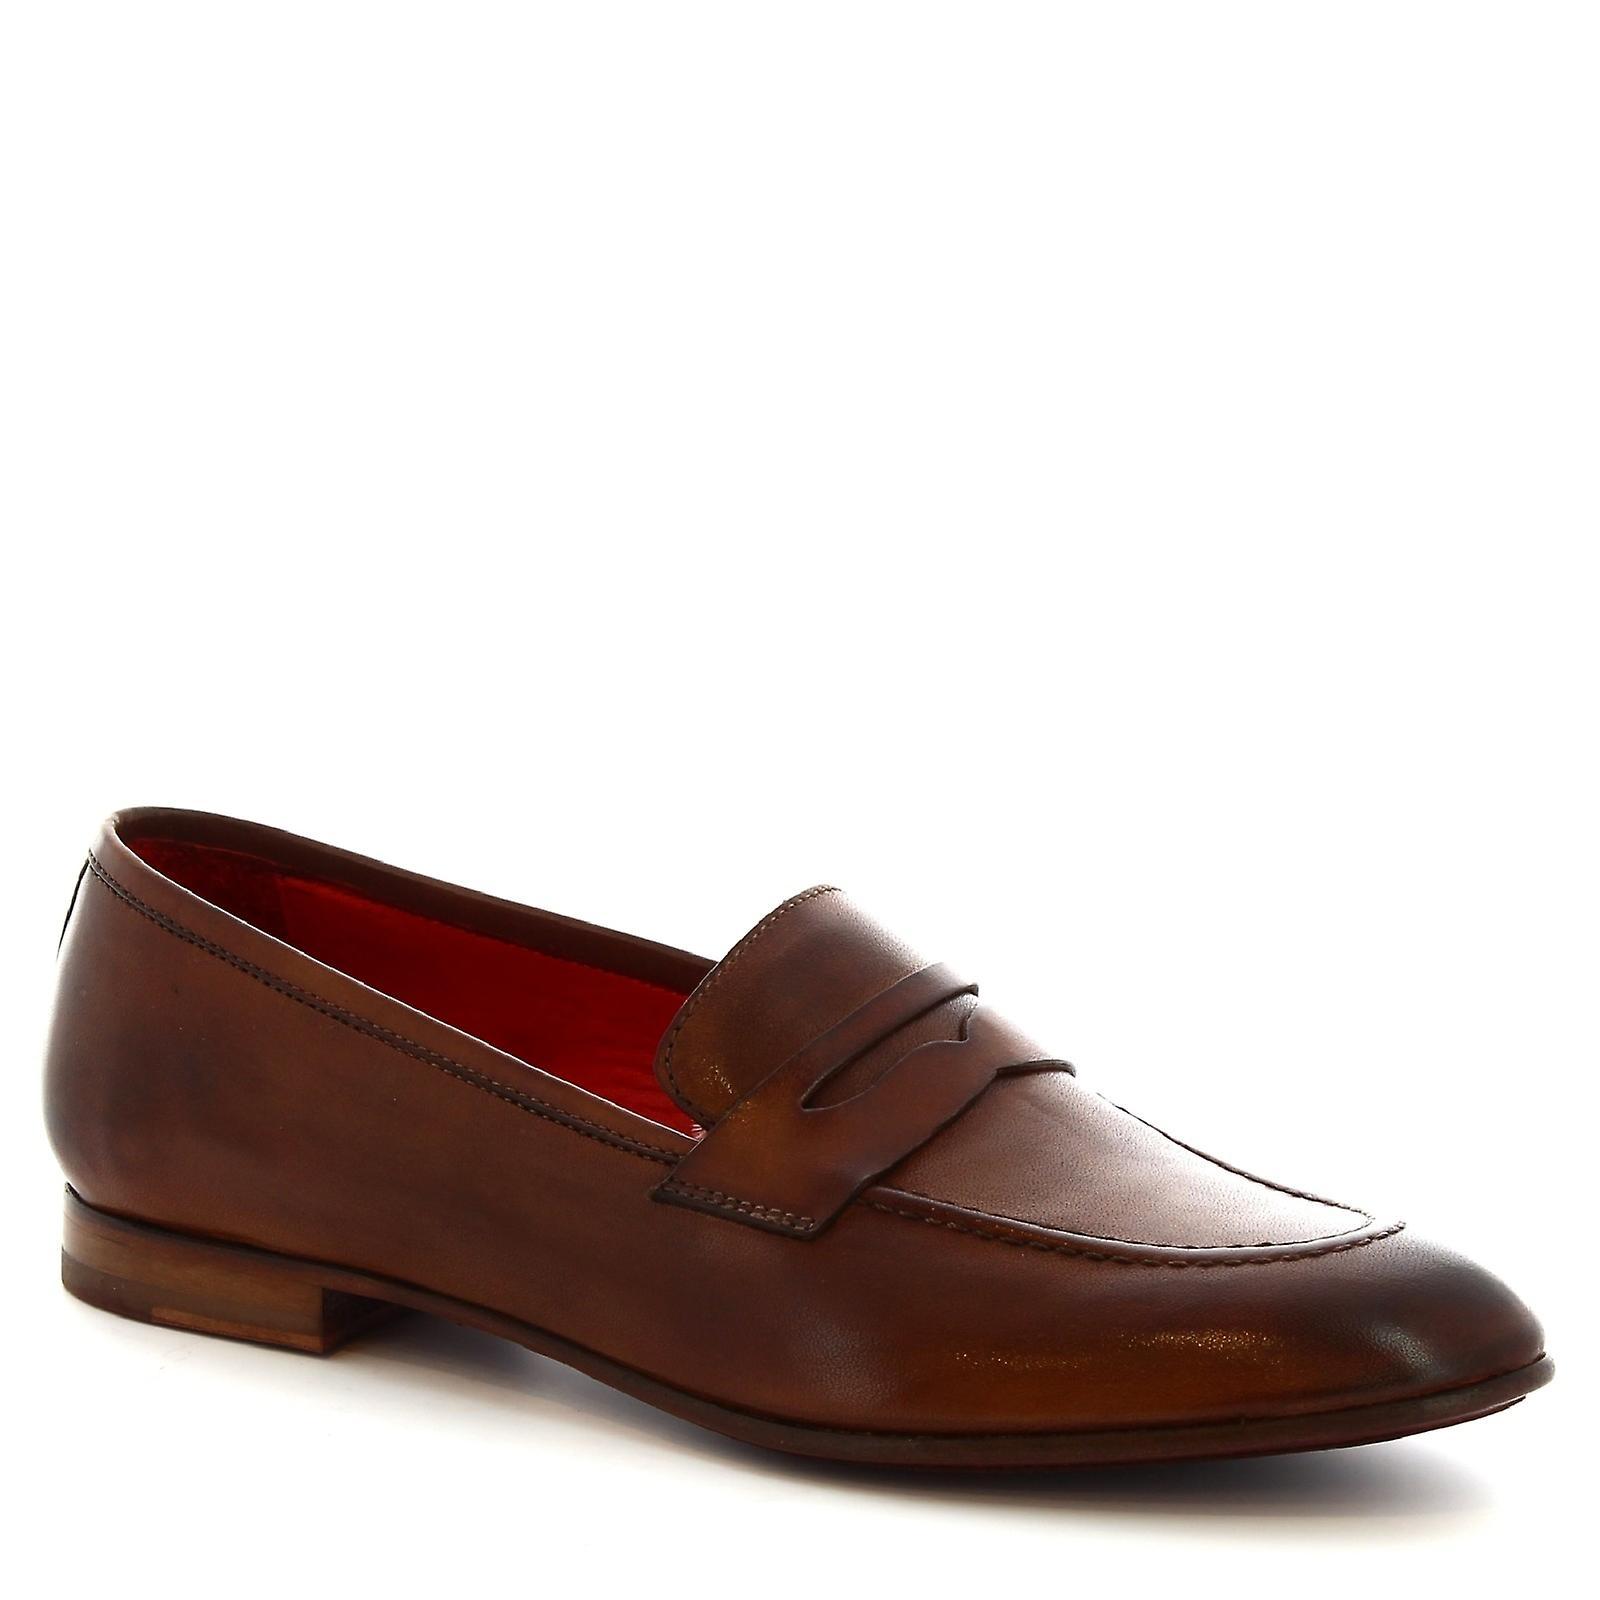 Leonardo Shoes Women's handmade slip-on loafers in brandy calf leather JOcyI